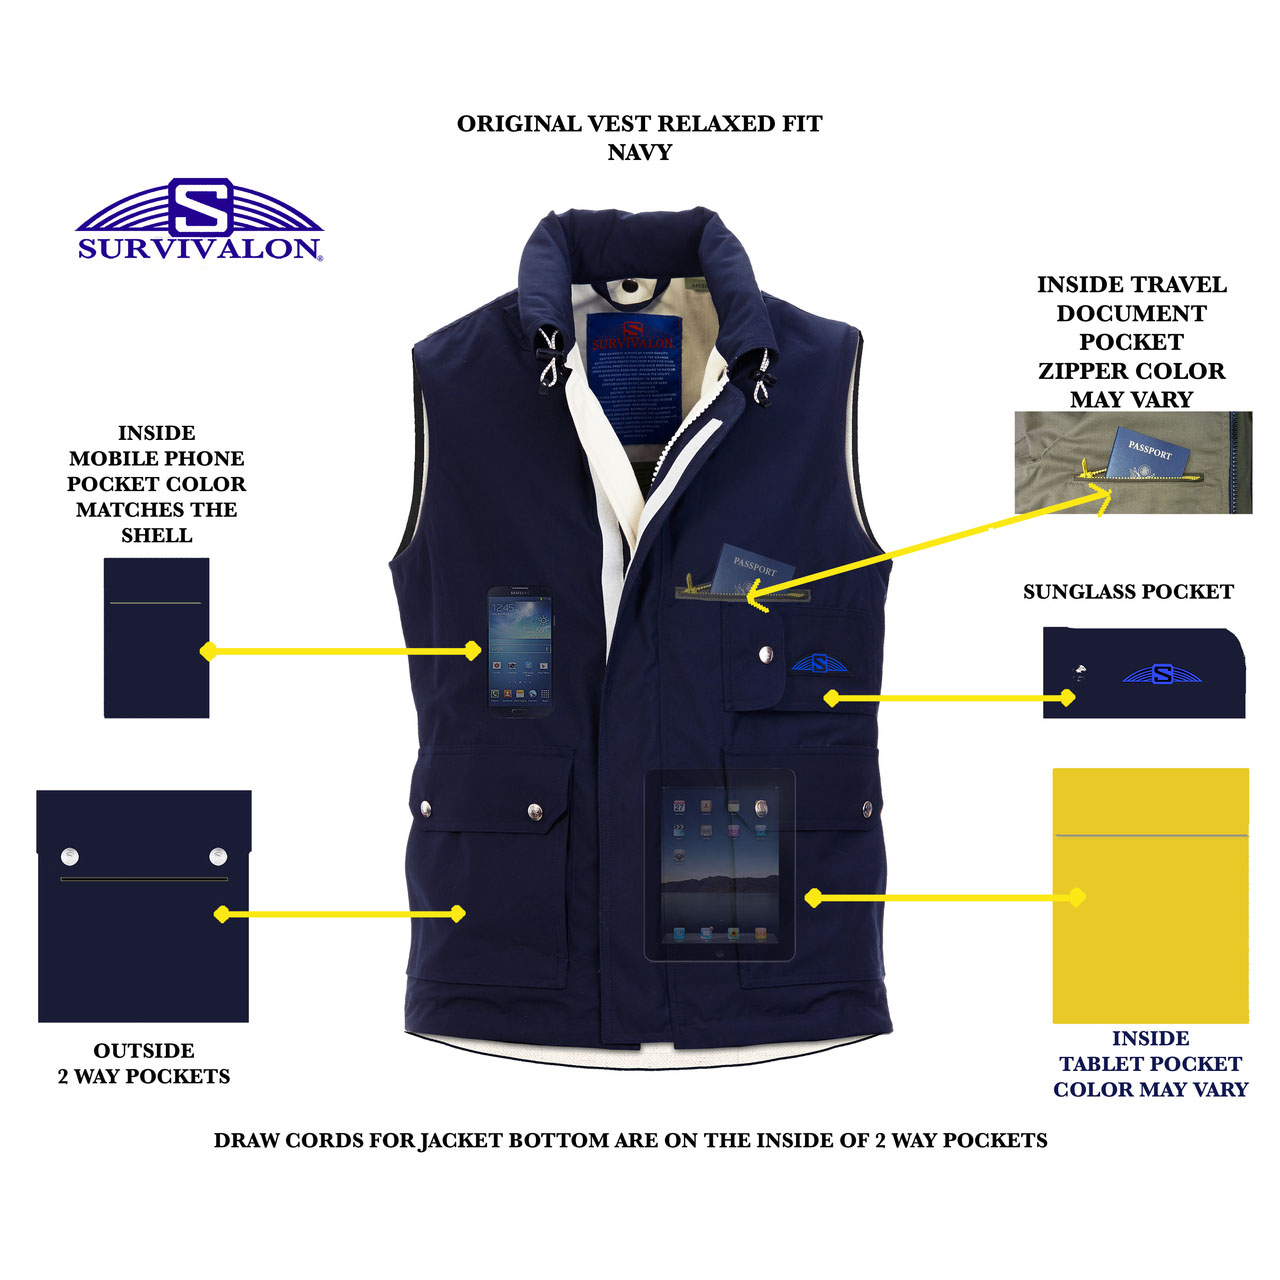 nvy-clsv-relaxed-fit-vest-details1-30493.1422746129.1280.1280.jpg